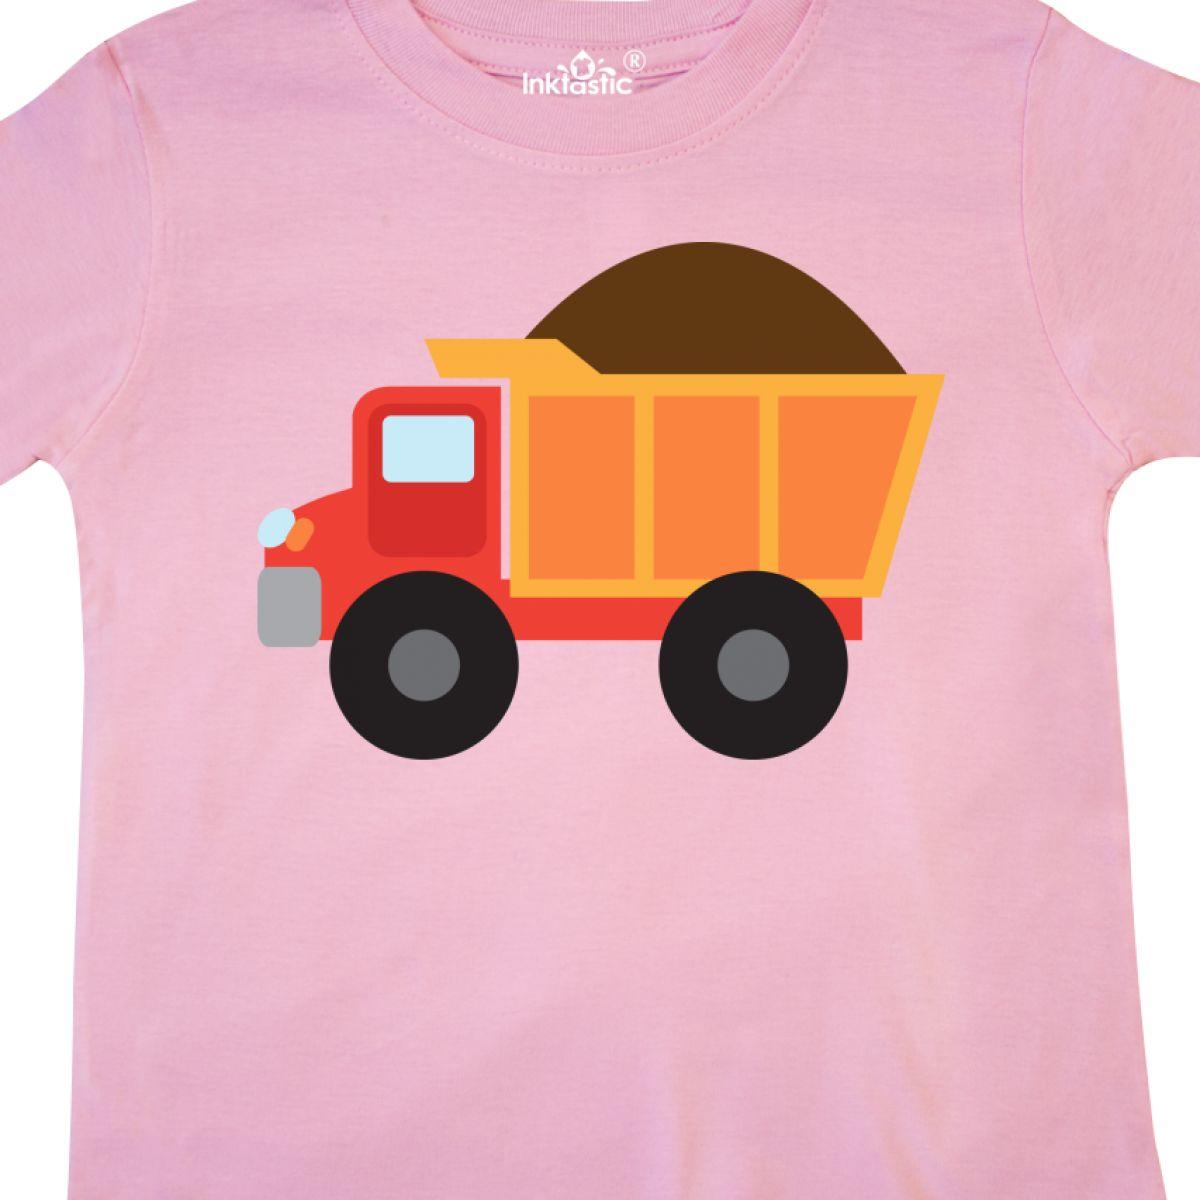 Inktastic-Work-Truck-Construction-Vehicle-Toddler-T-Shirt-Trucks-Vehicles-Cute thumbnail 26